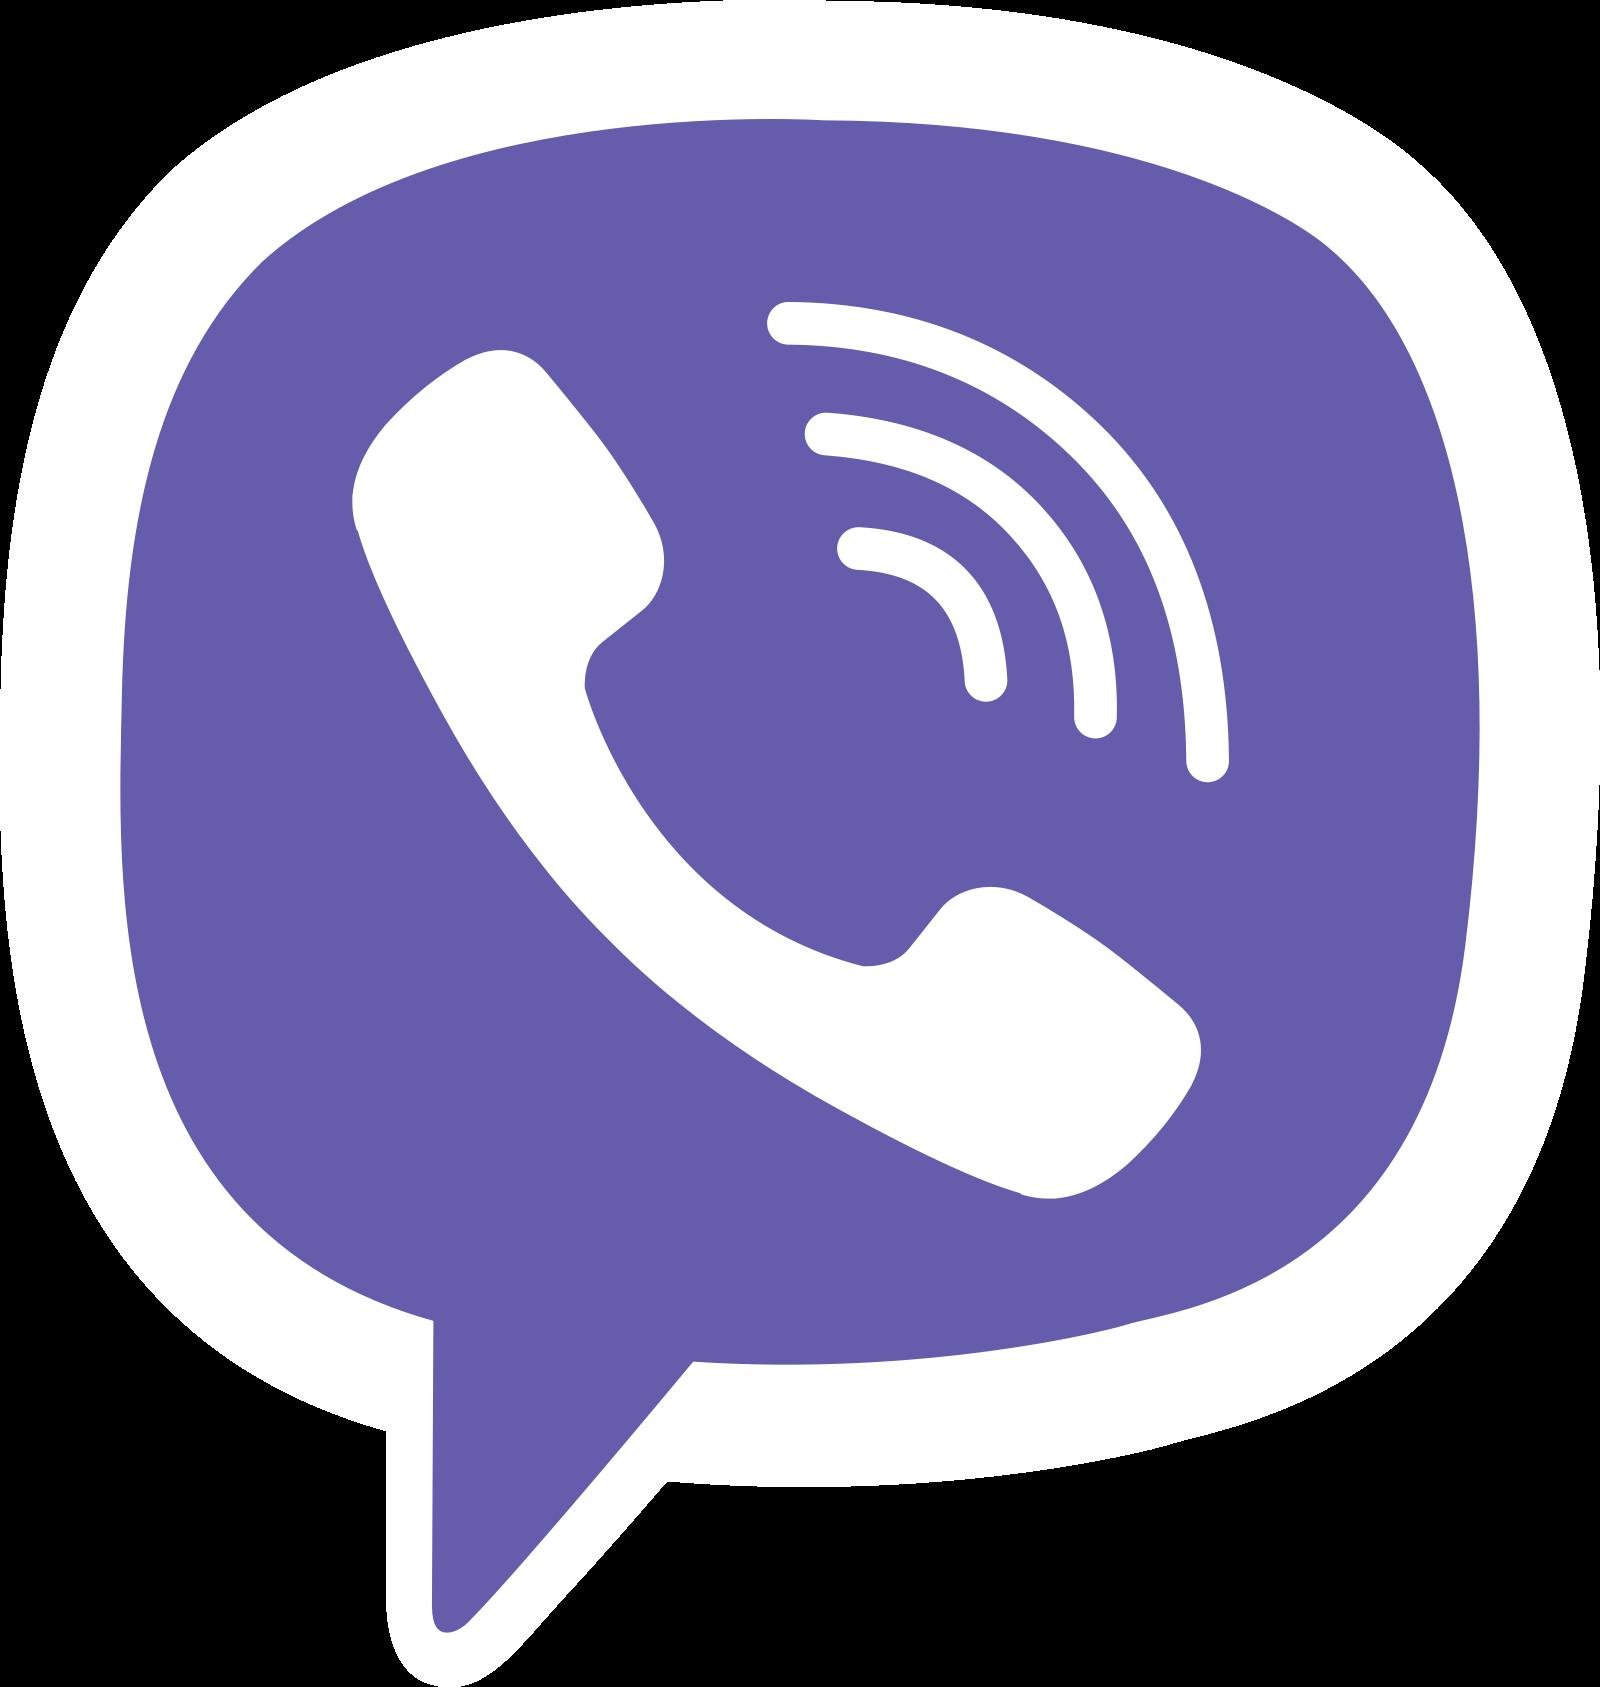 viber logo icon 5 - Rakuten Viber Logo - Icon